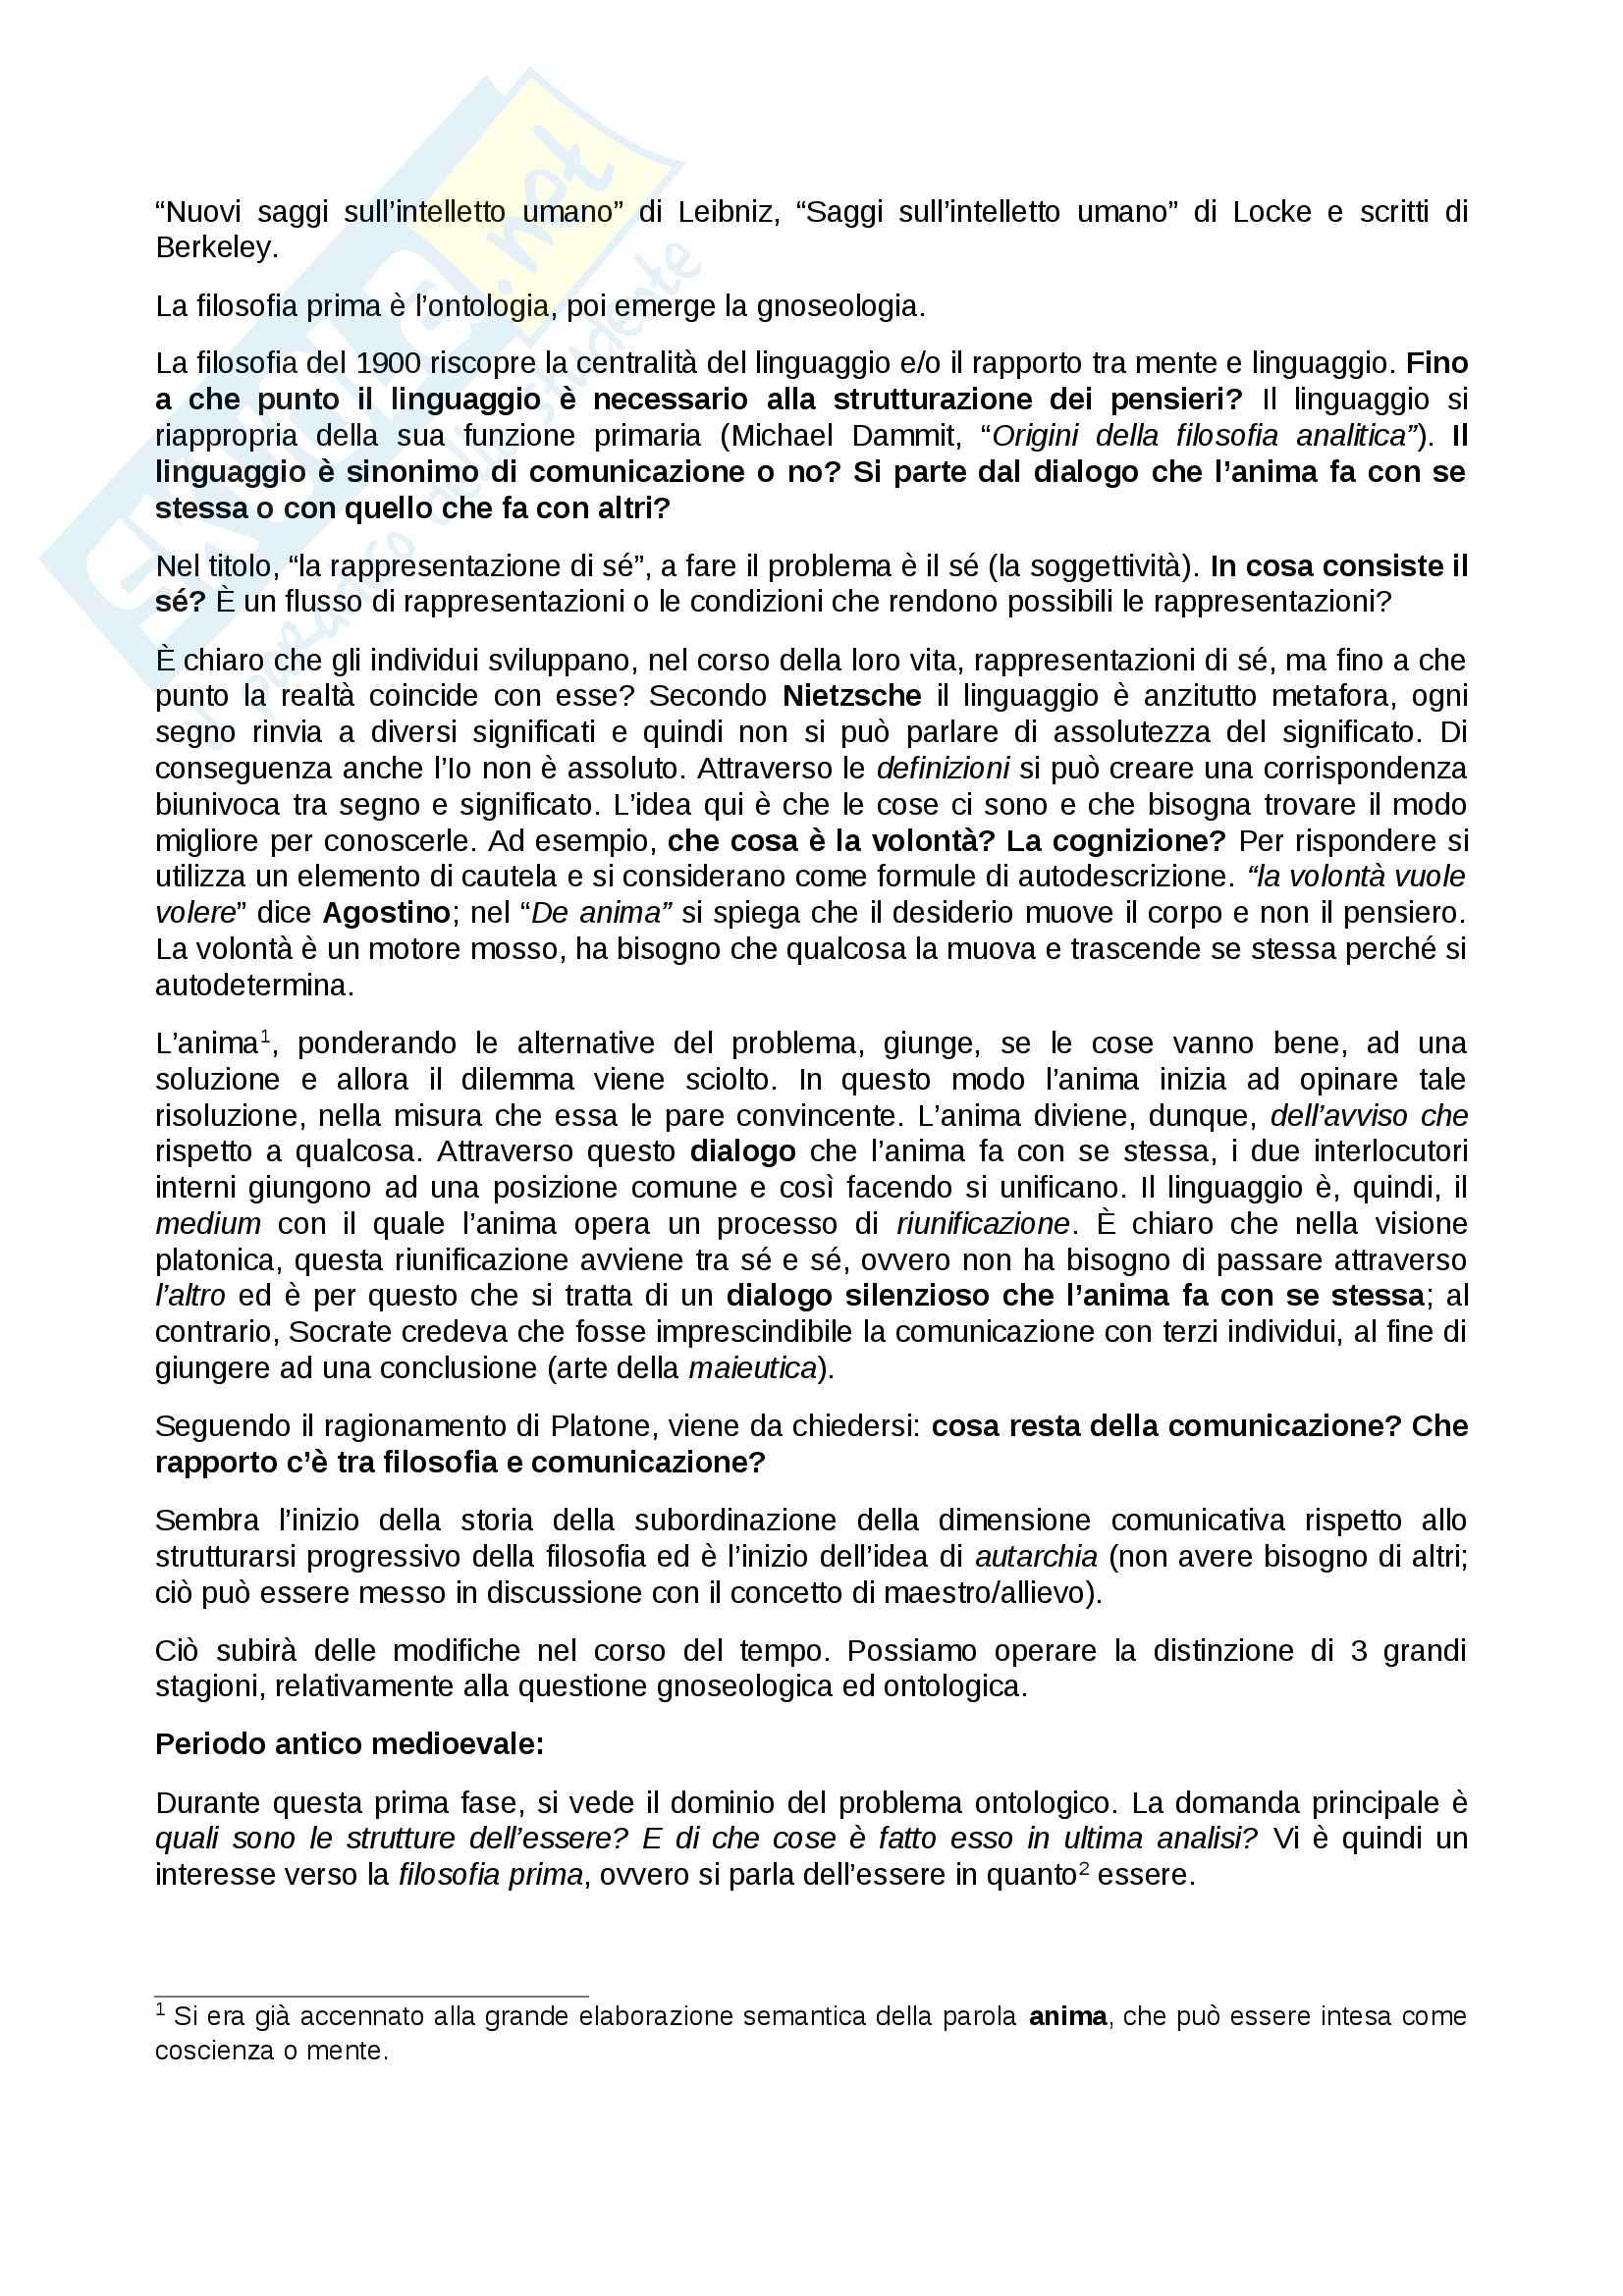 Panoramica Gnoseologia, Gnoseologia, Socrate - Platone - Aristotele - Descartes - Leibniz - Heidegger Pag. 2